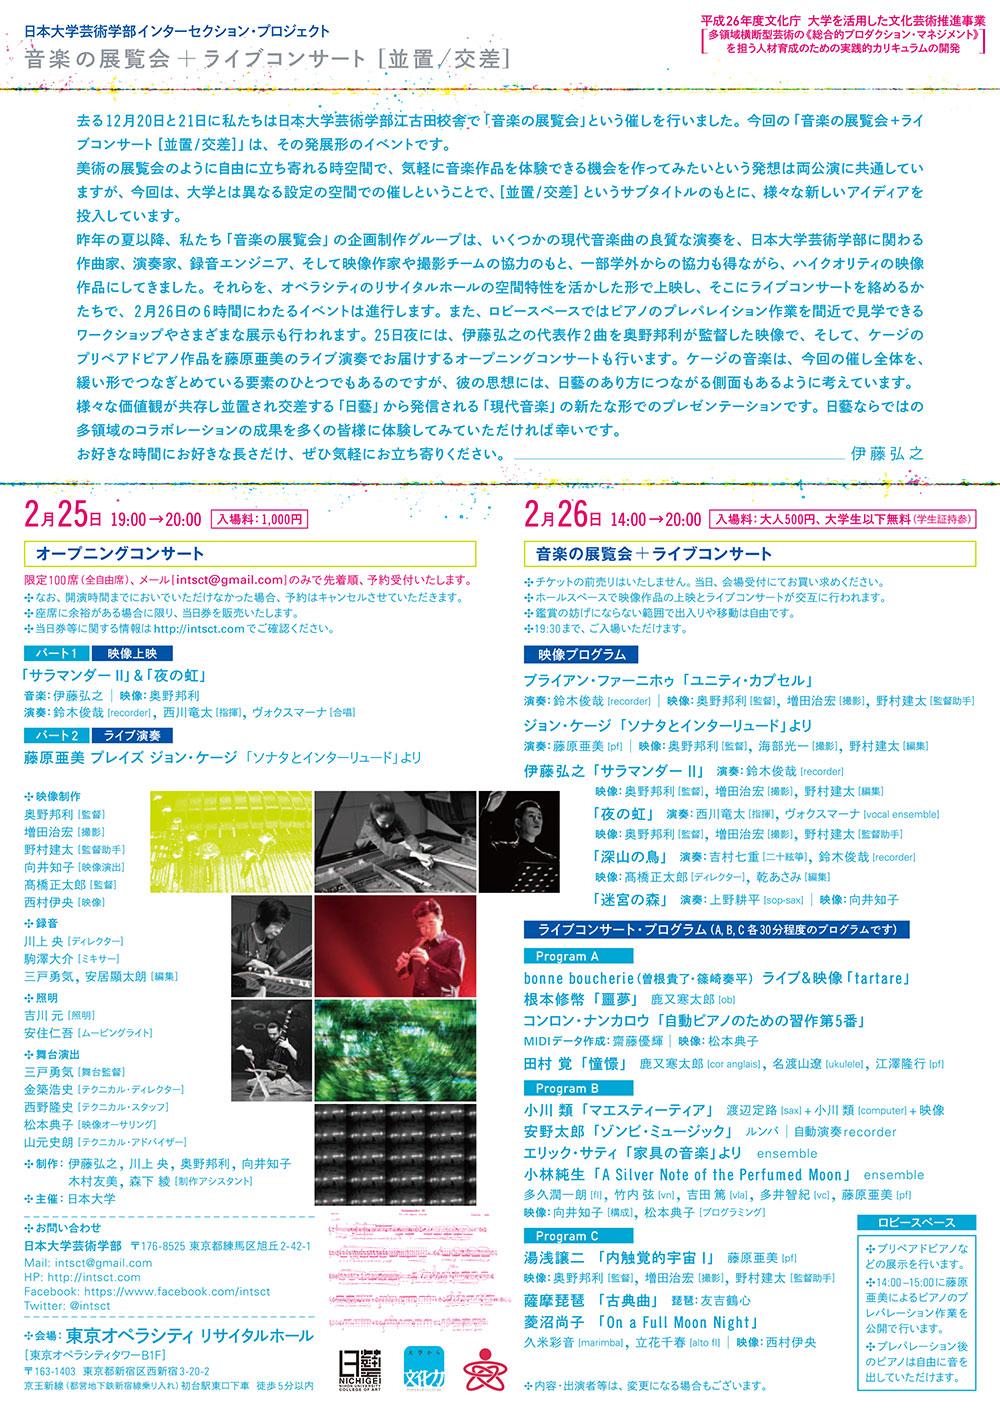 0225-26_flyer2